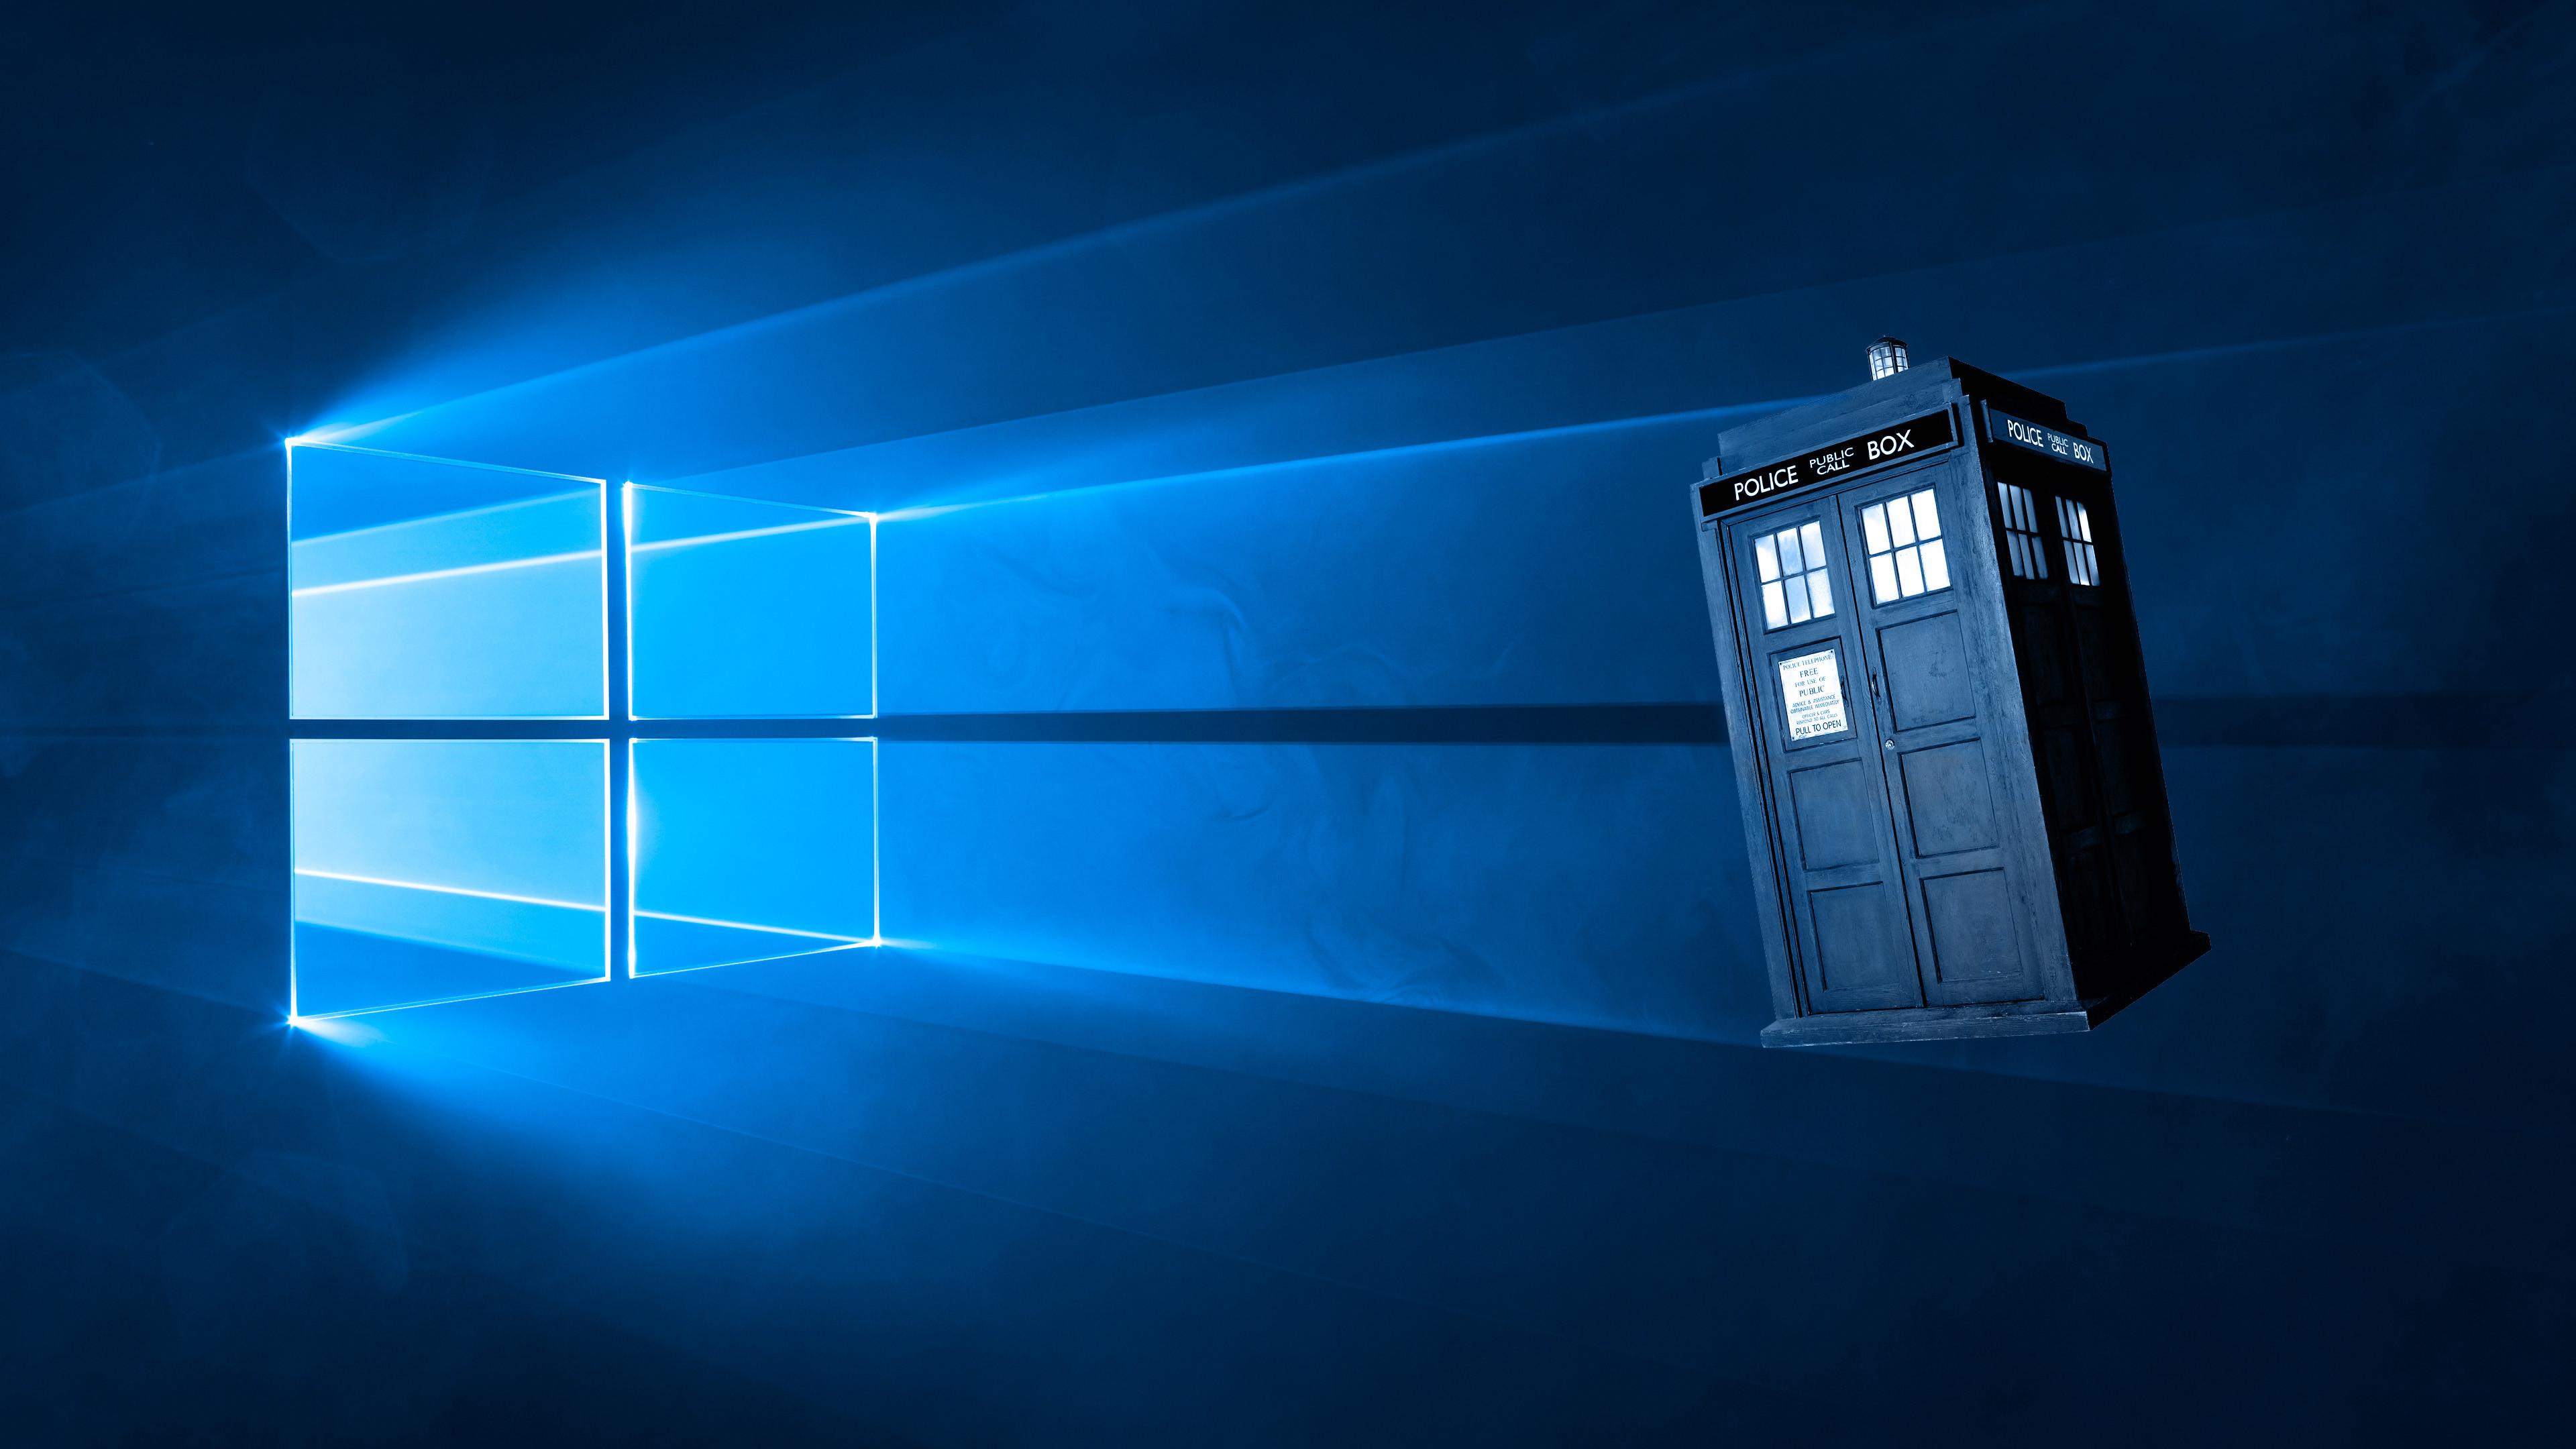 Fantastic Wallpaper Mac Doctor Who - 809181-tardis-wallpapers-3840x2160-for-macbook  Pictures_129964.jpg